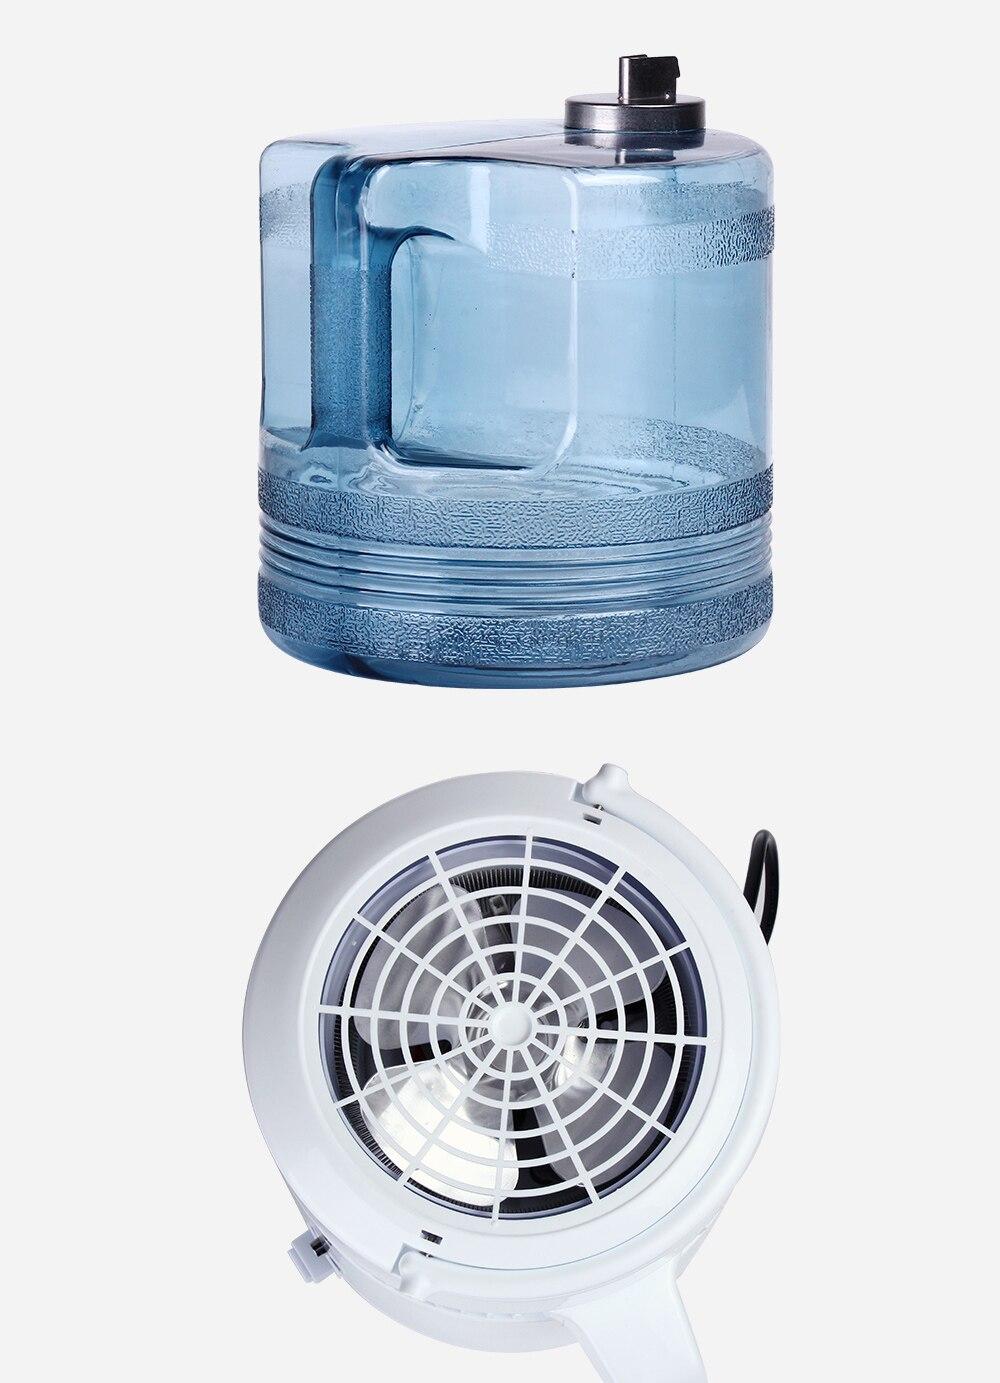 Housing Use Pure Water Distiller 4L Distilled Water Machine Distillation Purifier Stainless Steel Water Filter Russian Manual - 4